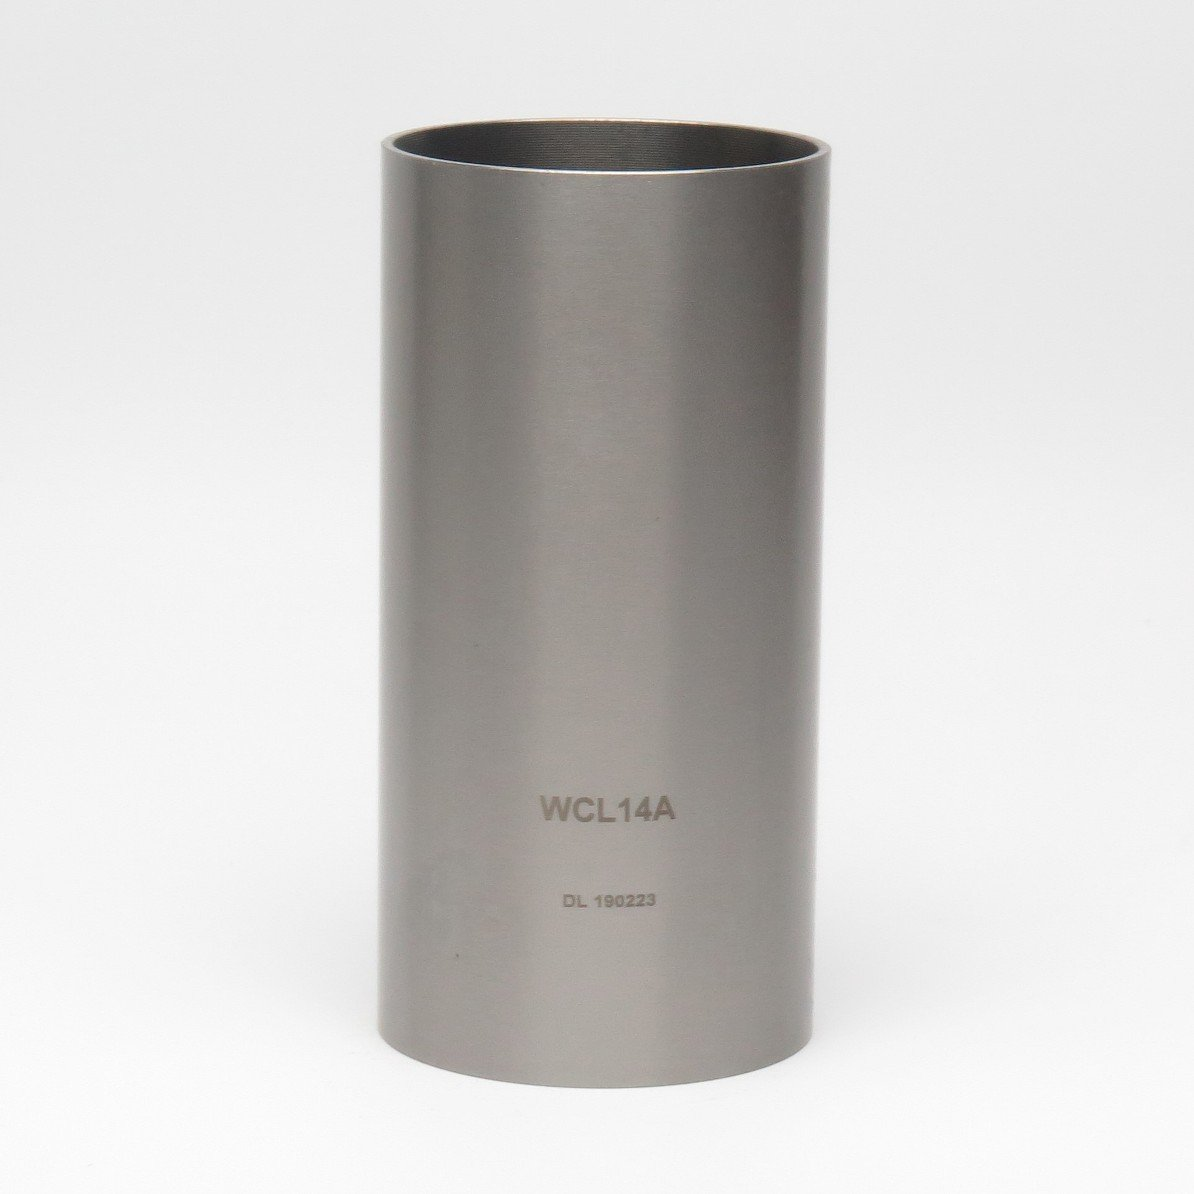 WCL 14A - Plain Repair Liner